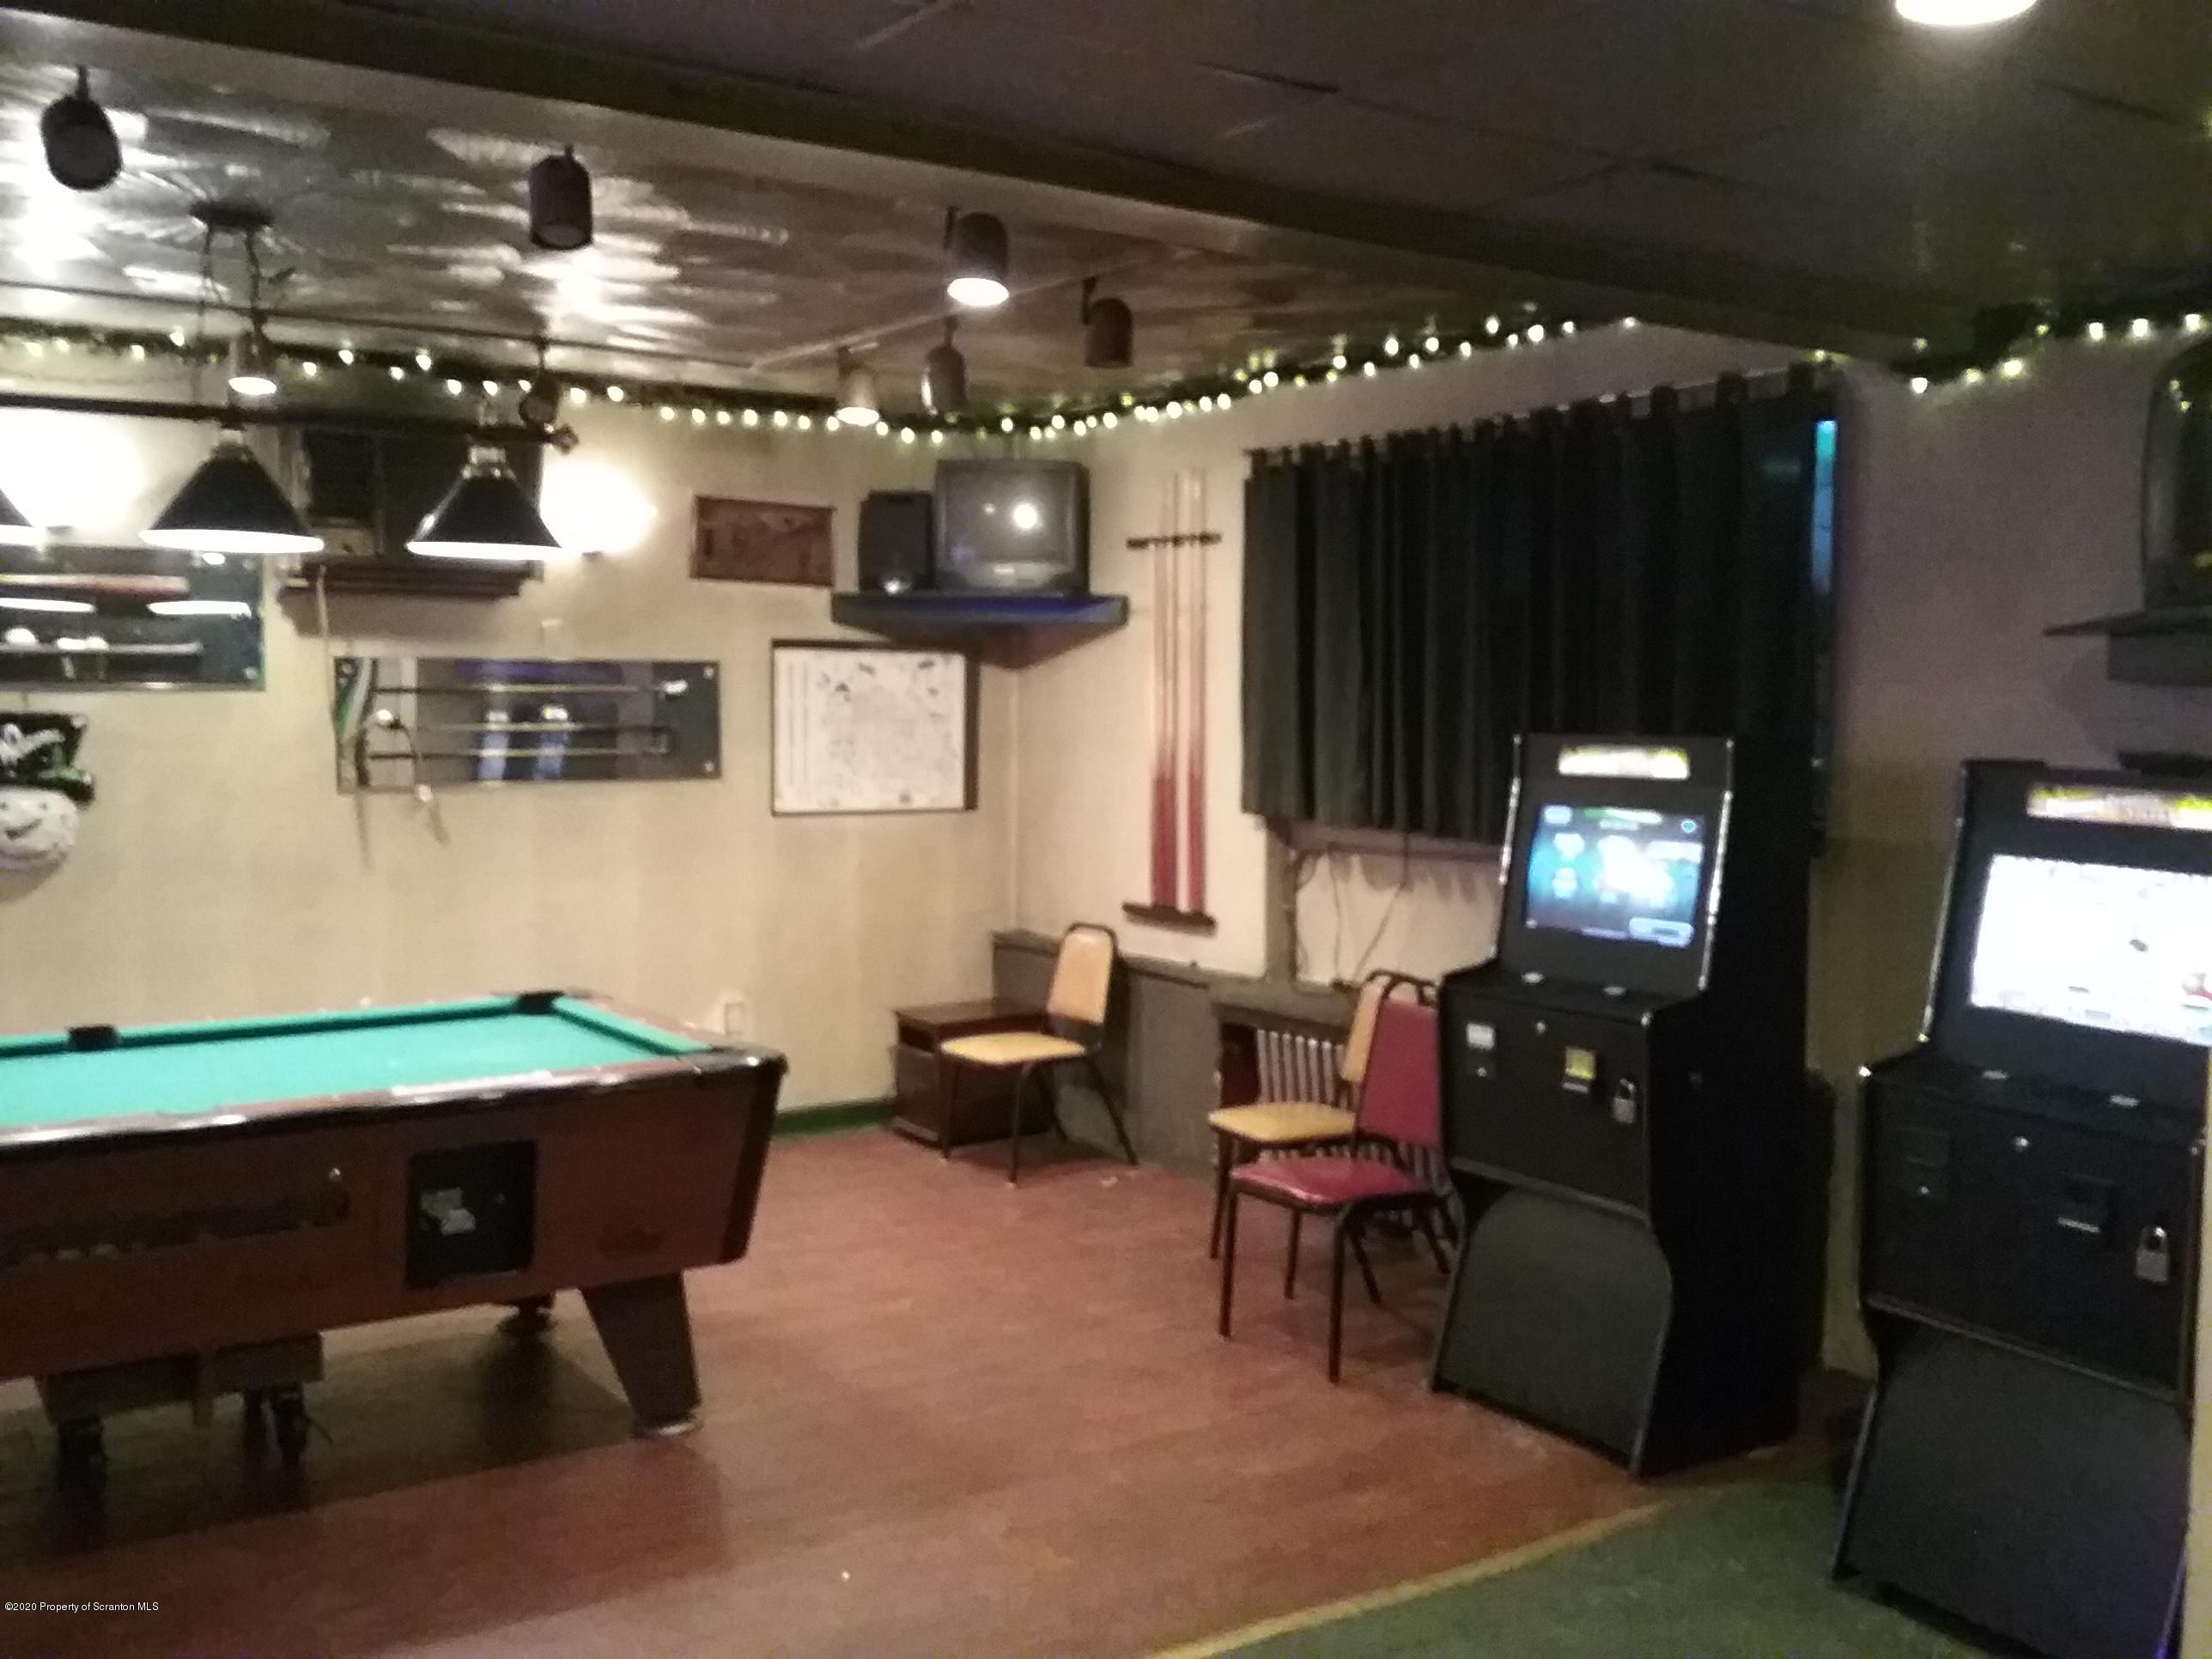 932 Wyoming Ave, Scranton, Pennsylvania 18509, ,2 BathroomsBathrooms,Commercial,For Sale,Wyoming,20-169